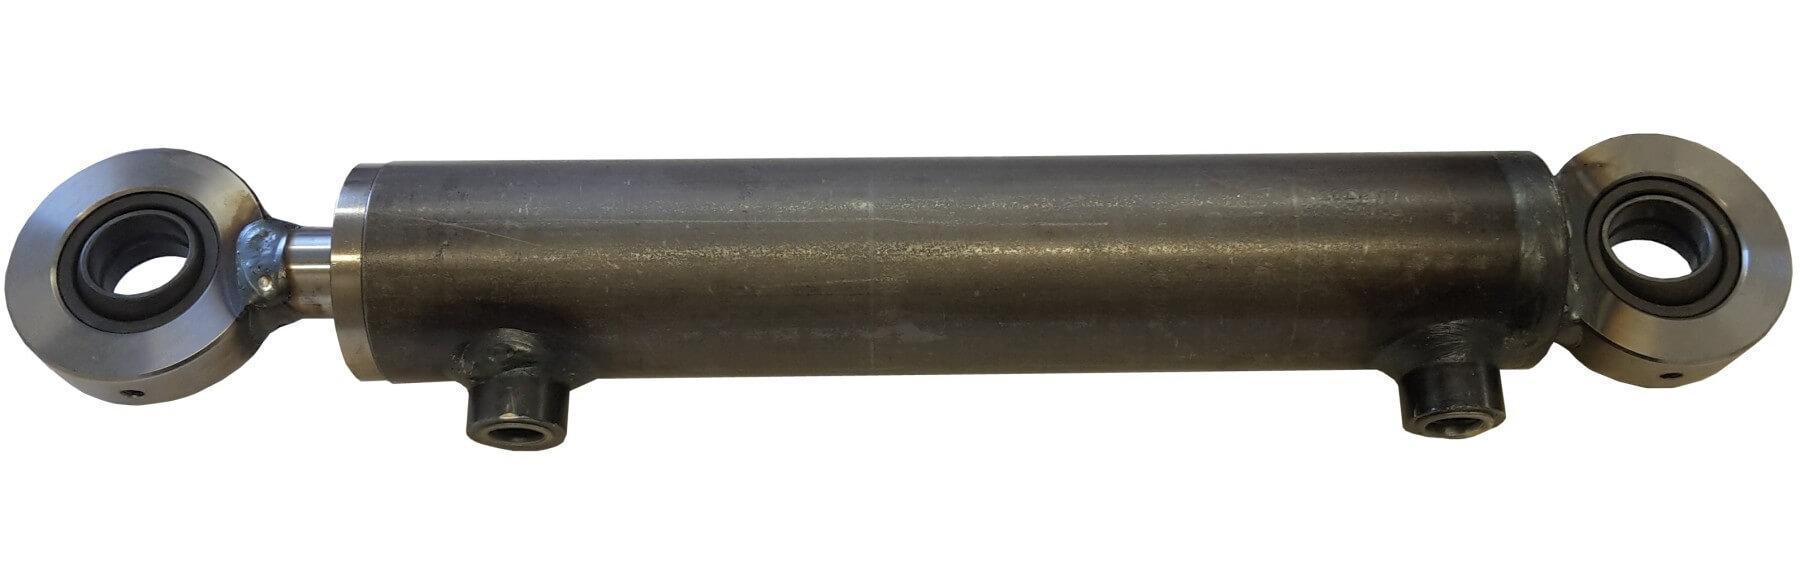 Hydraulisylinteri CL 70. 40. 600 GE